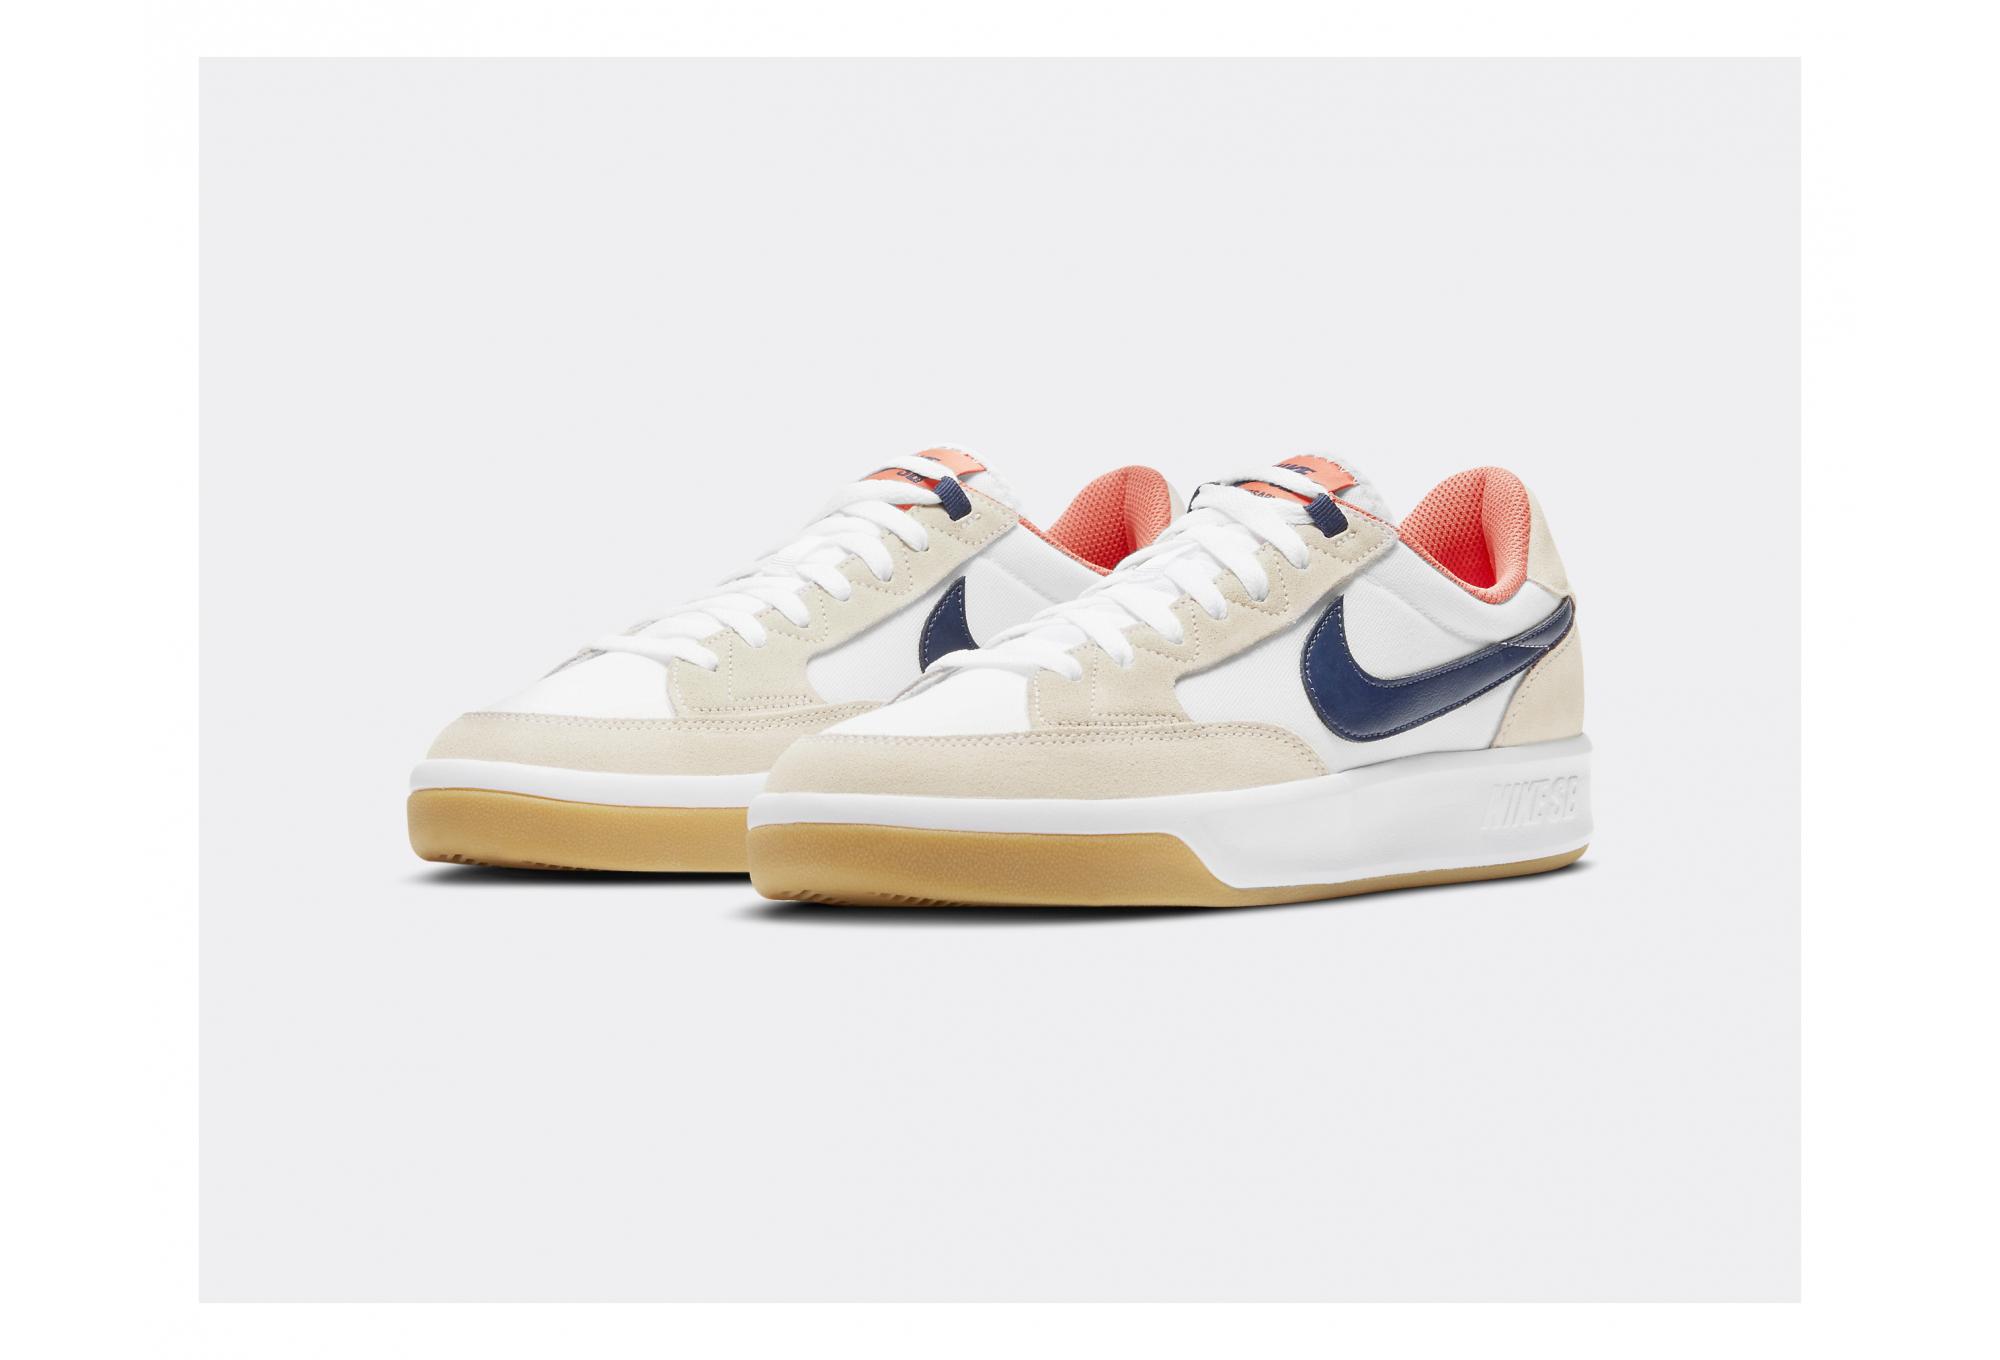 Nike SB Adversary Premium Beige / Blue Shoes | Alltricks.com